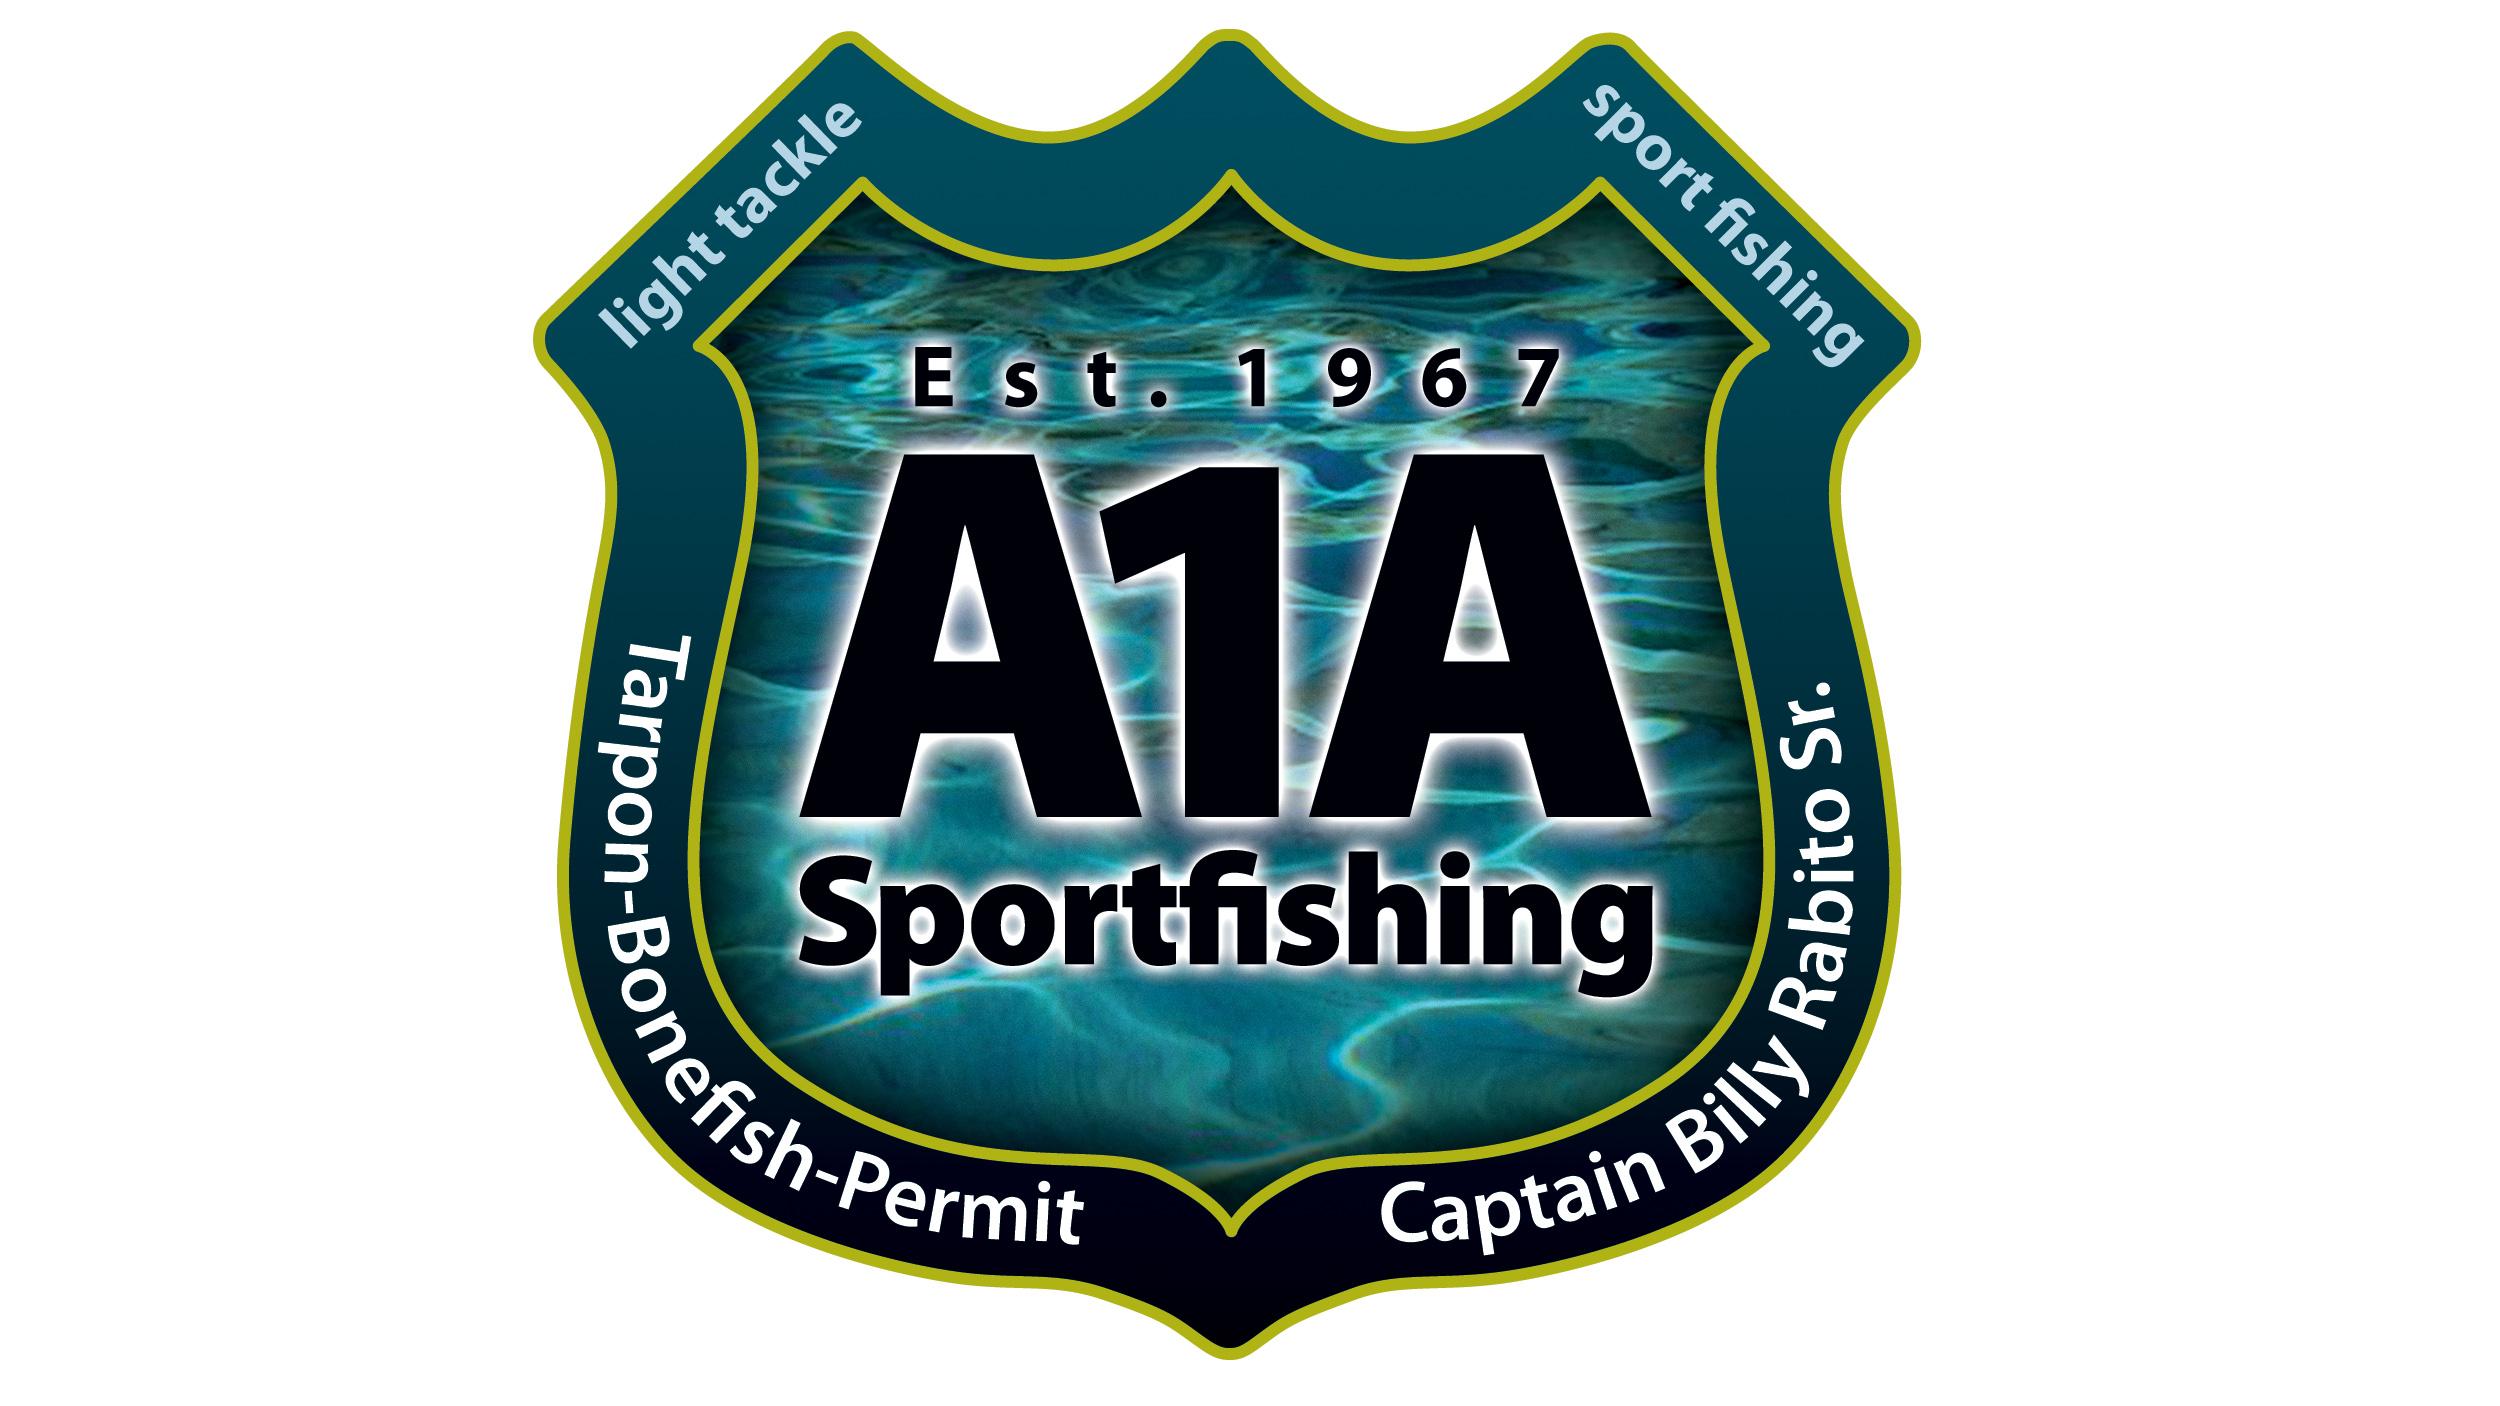 A1A-sportfishing-Logos-Brand-Identity.jpg